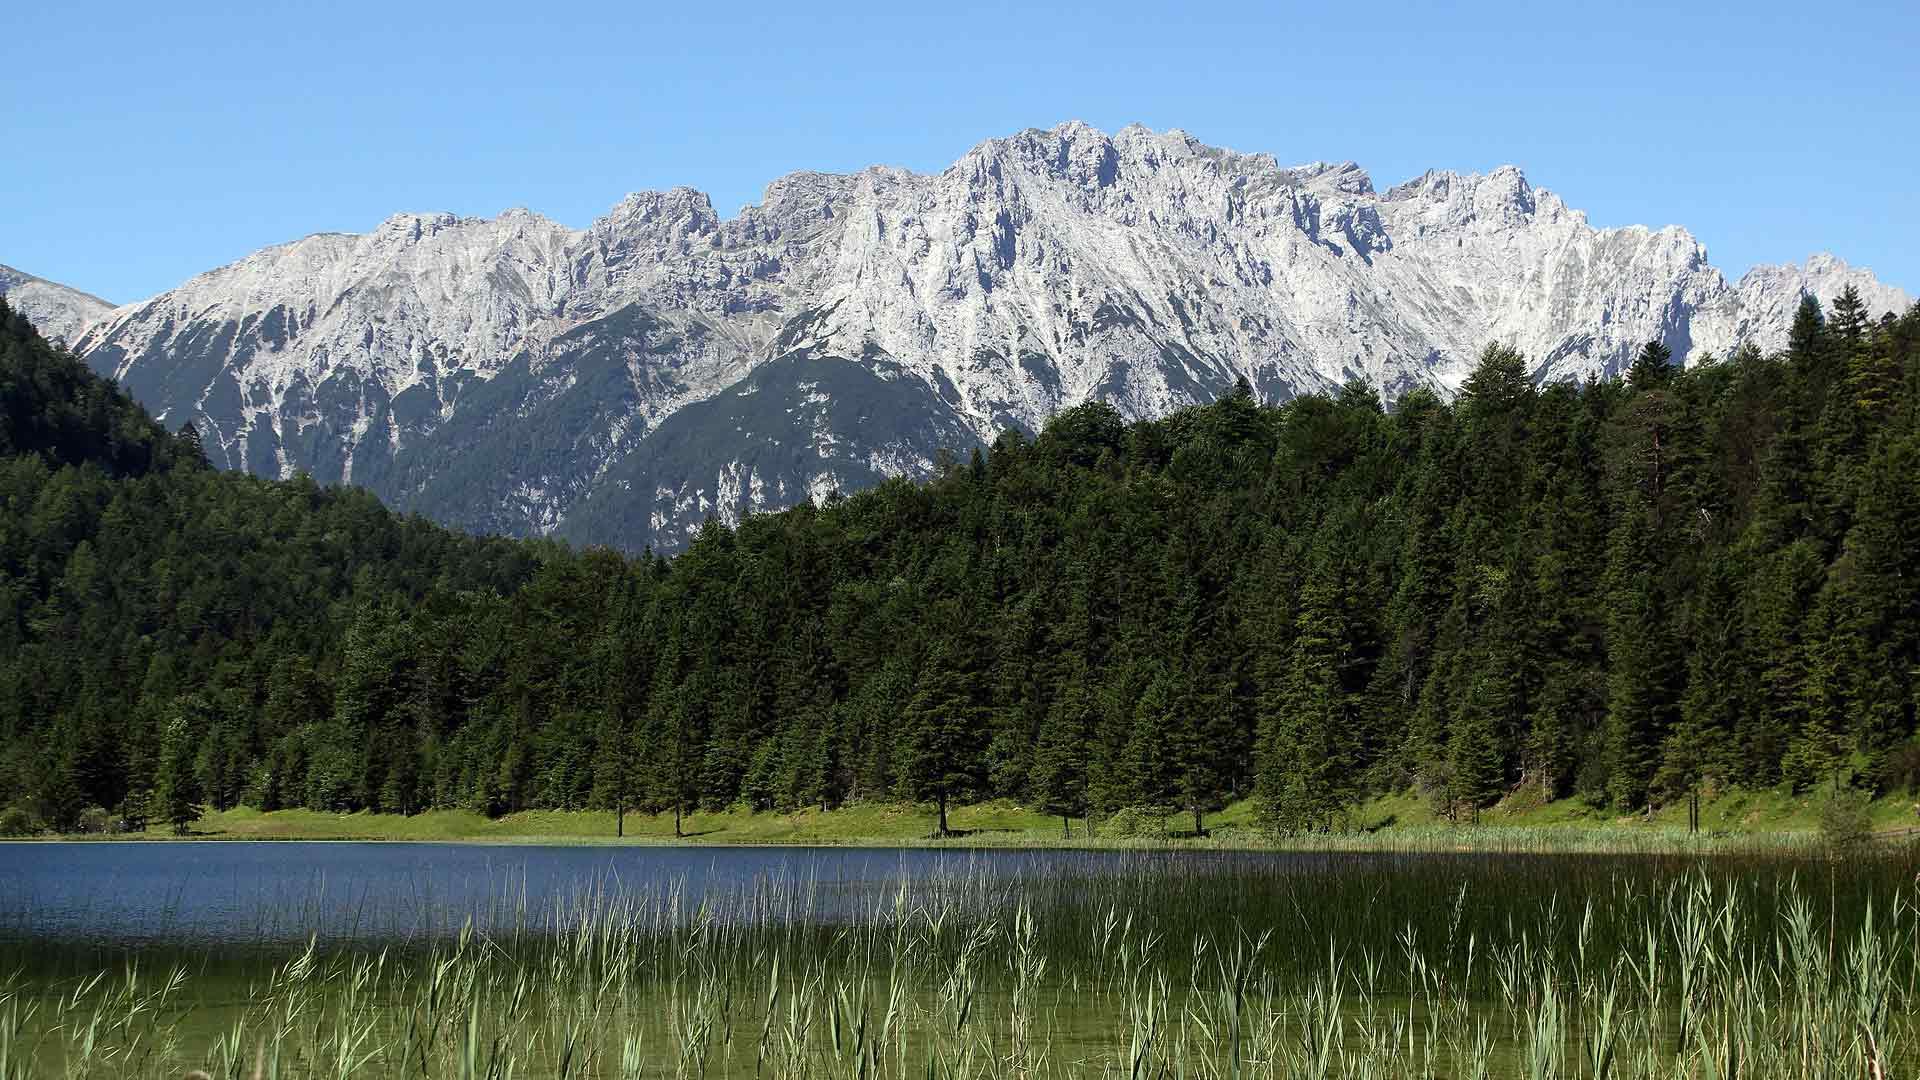 Обои густой лес и горы лес